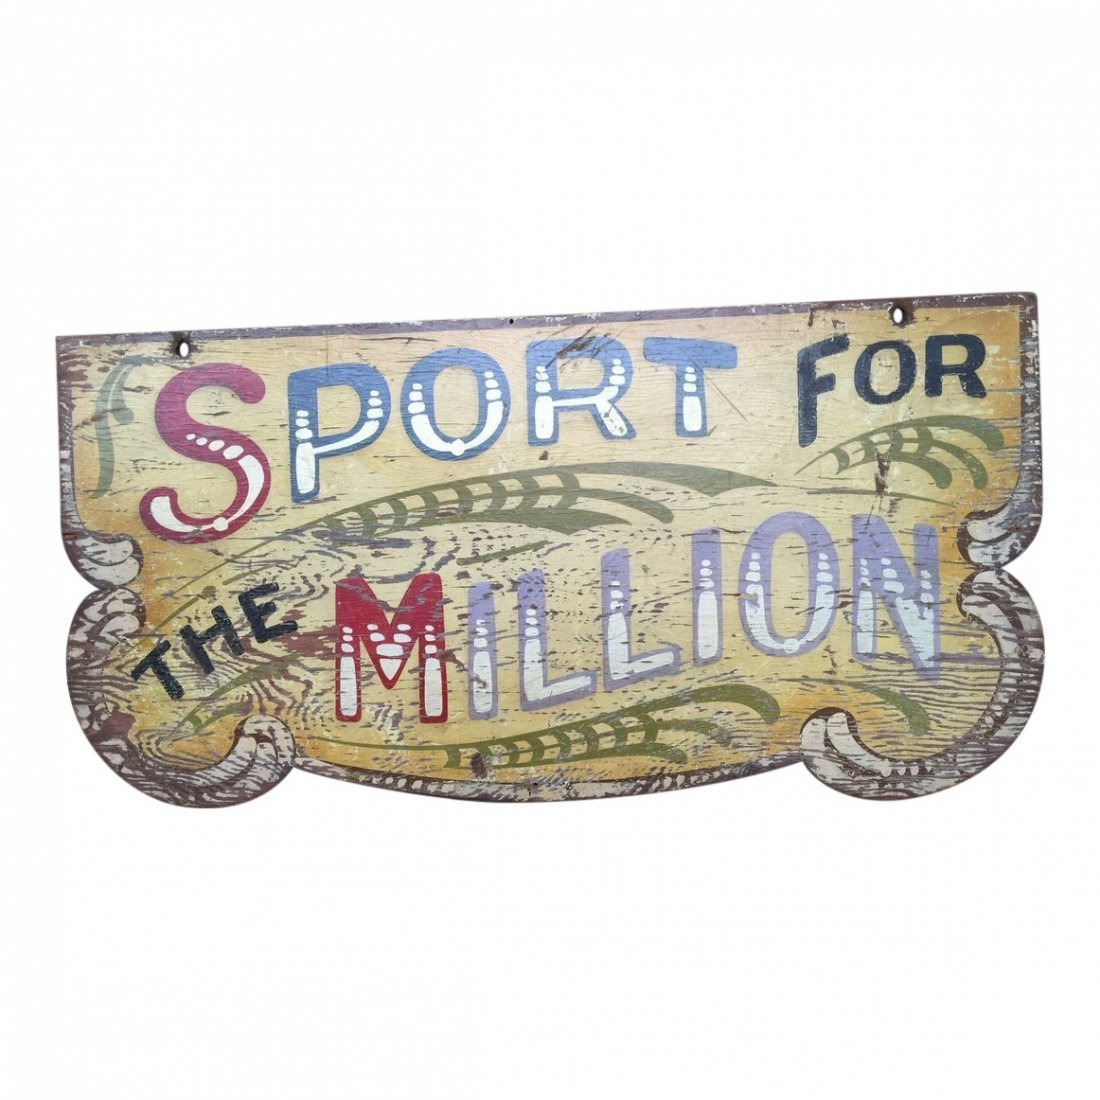 1910 Polychrome Carnival Arcade Sign